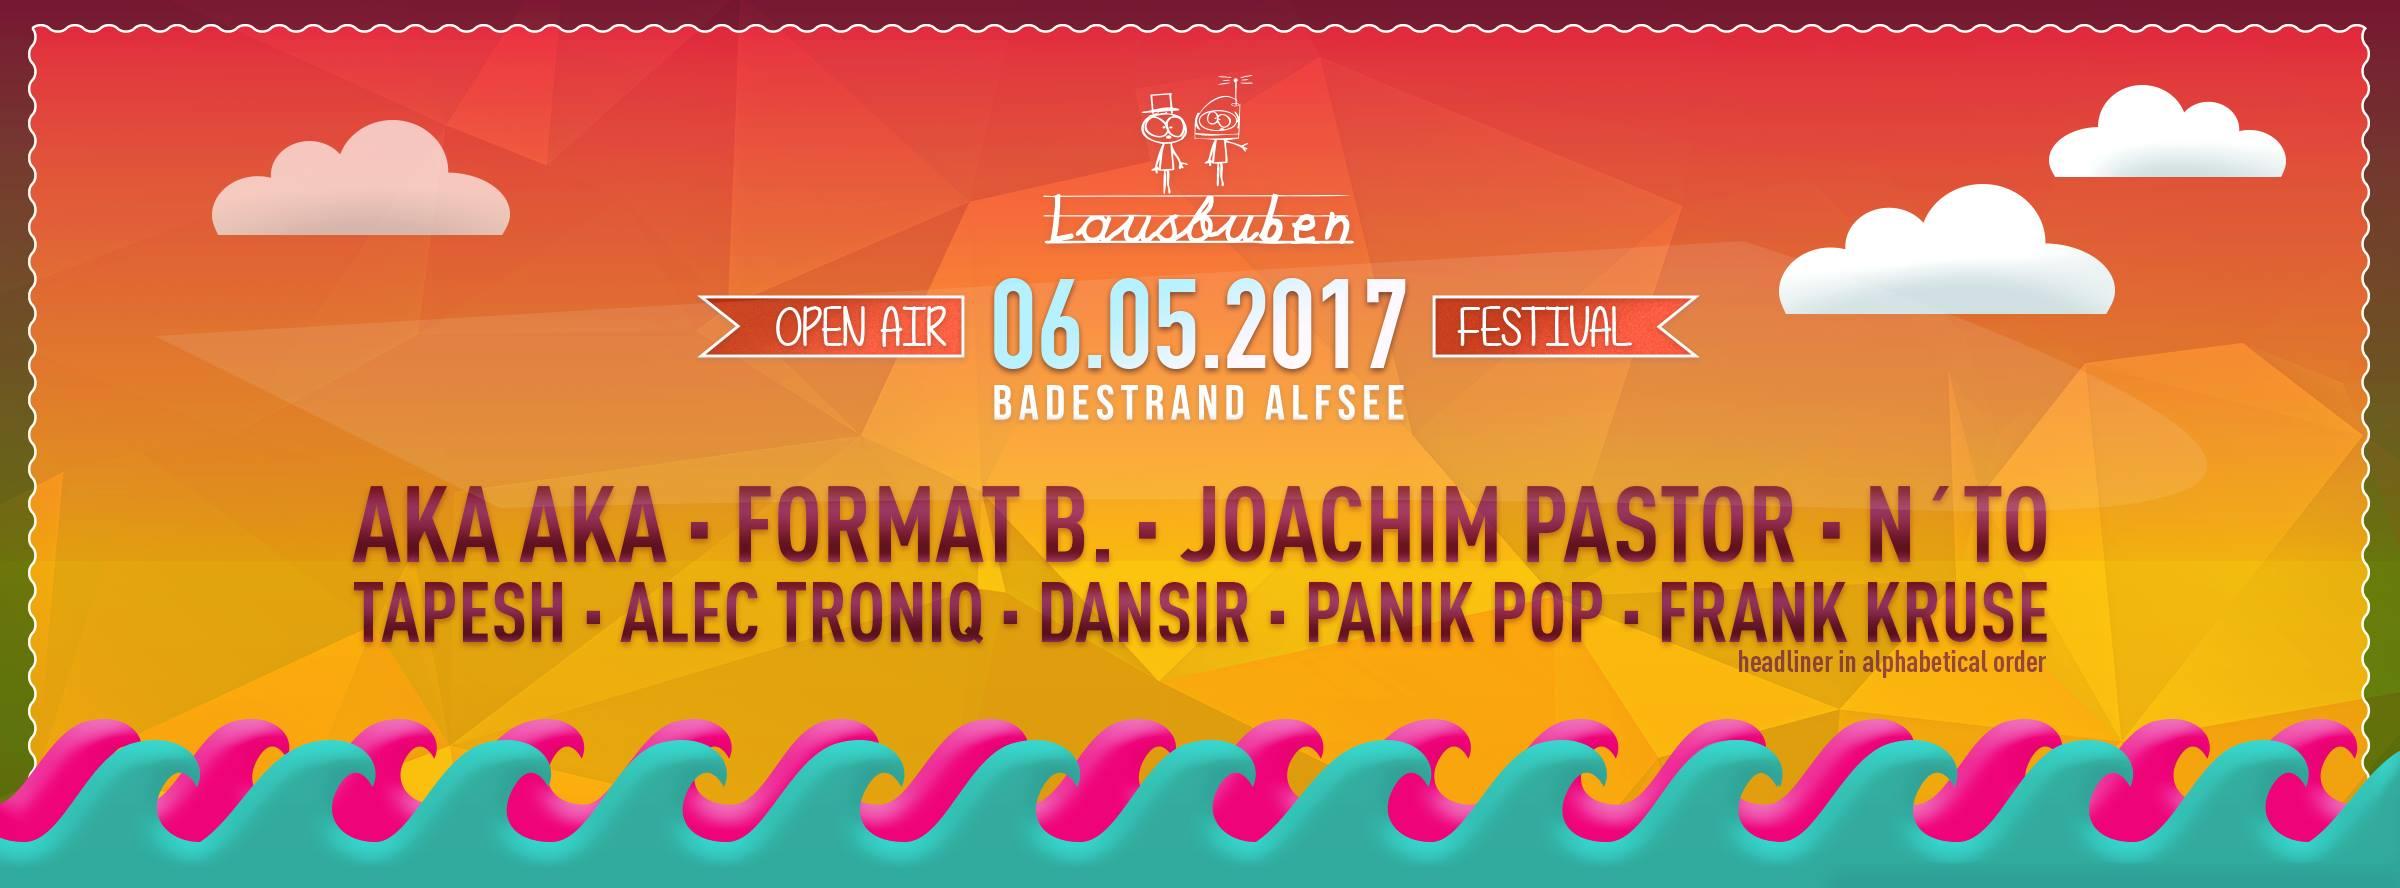 6.5.2017 - Lausbuben Open Air Festival [Alfsee]